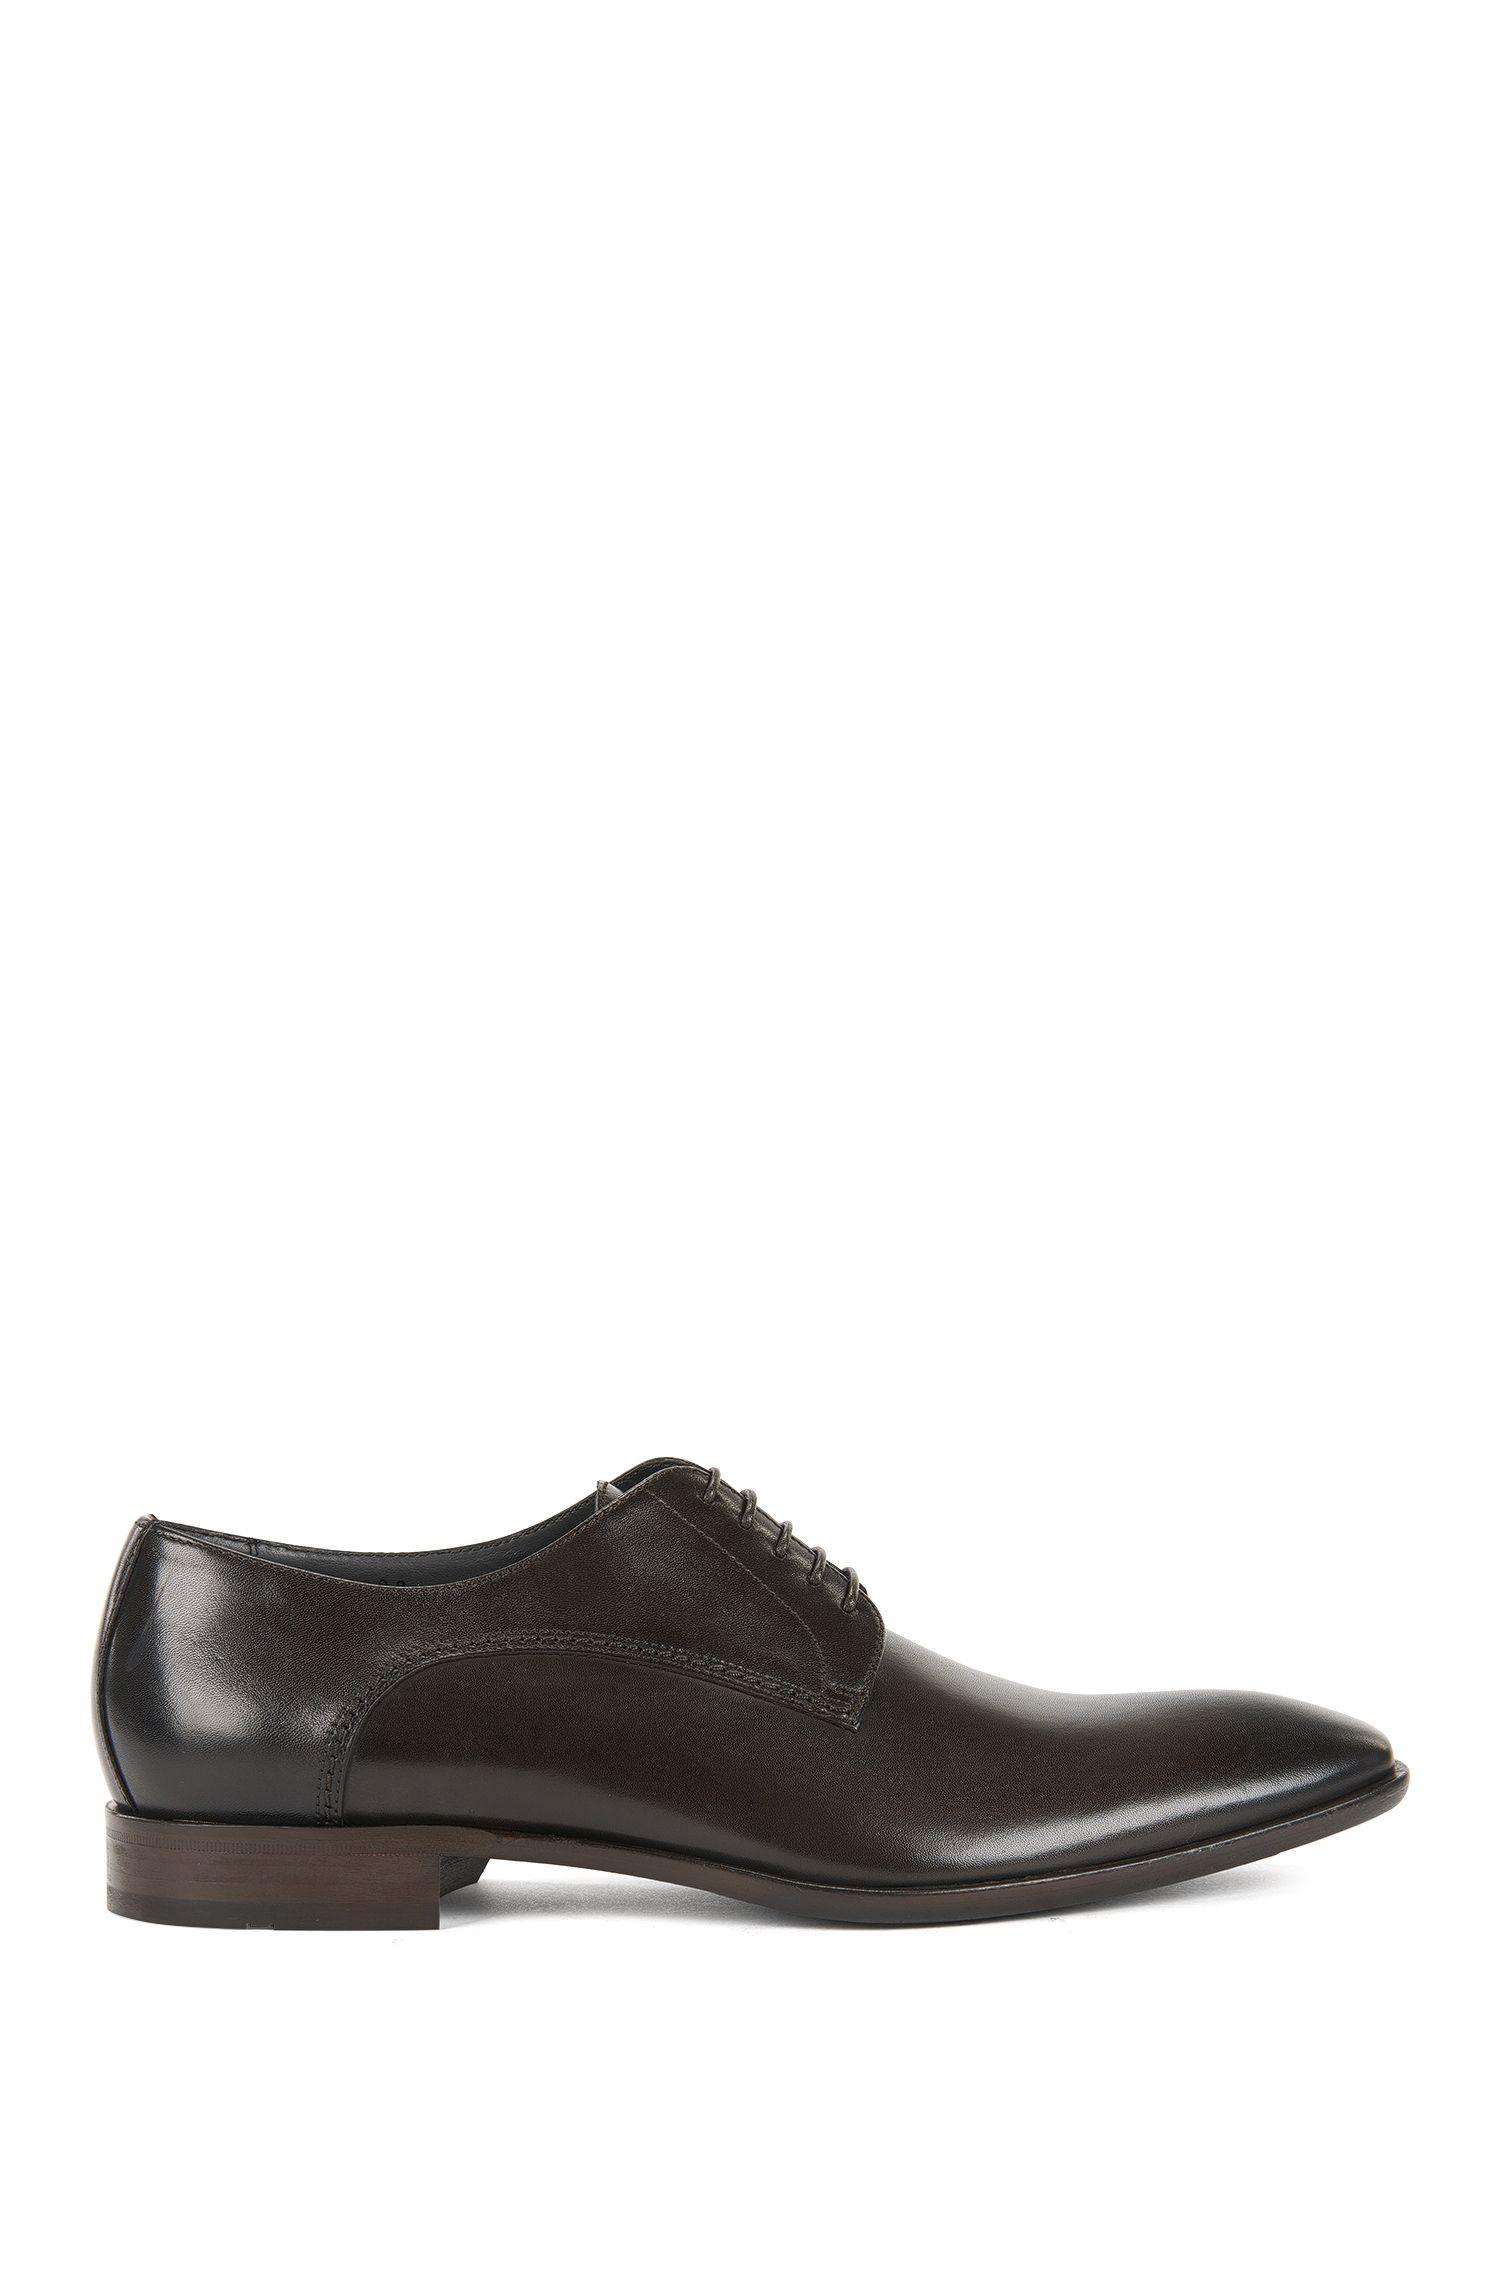 Oxford-Schuhe aus Leder in antiker Optik